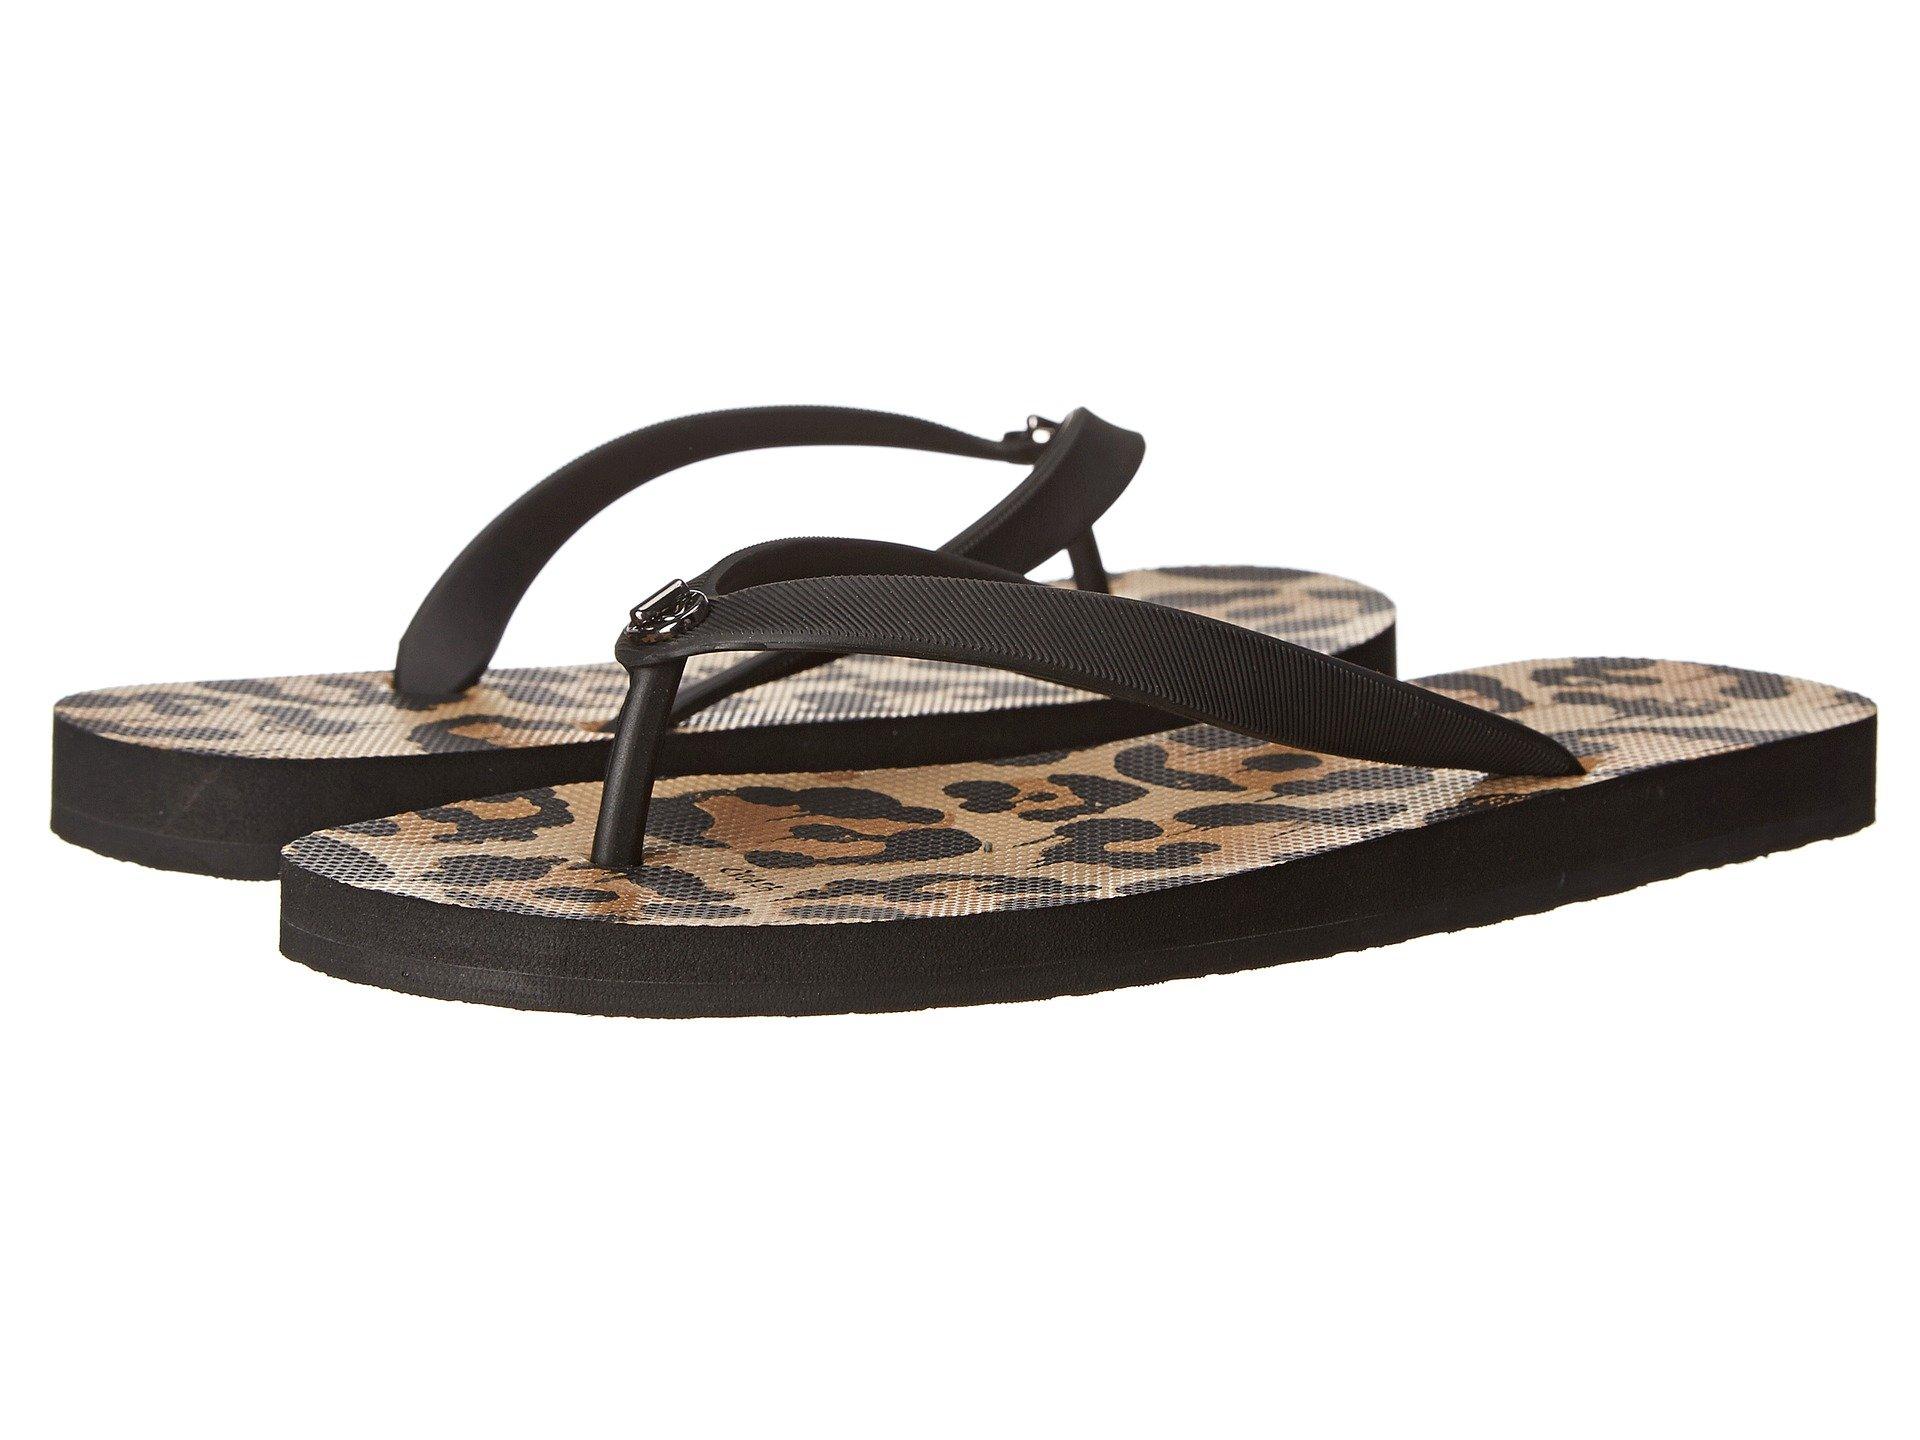 Womens Sandals COACH Alyssa Black/Natural Wild Beast